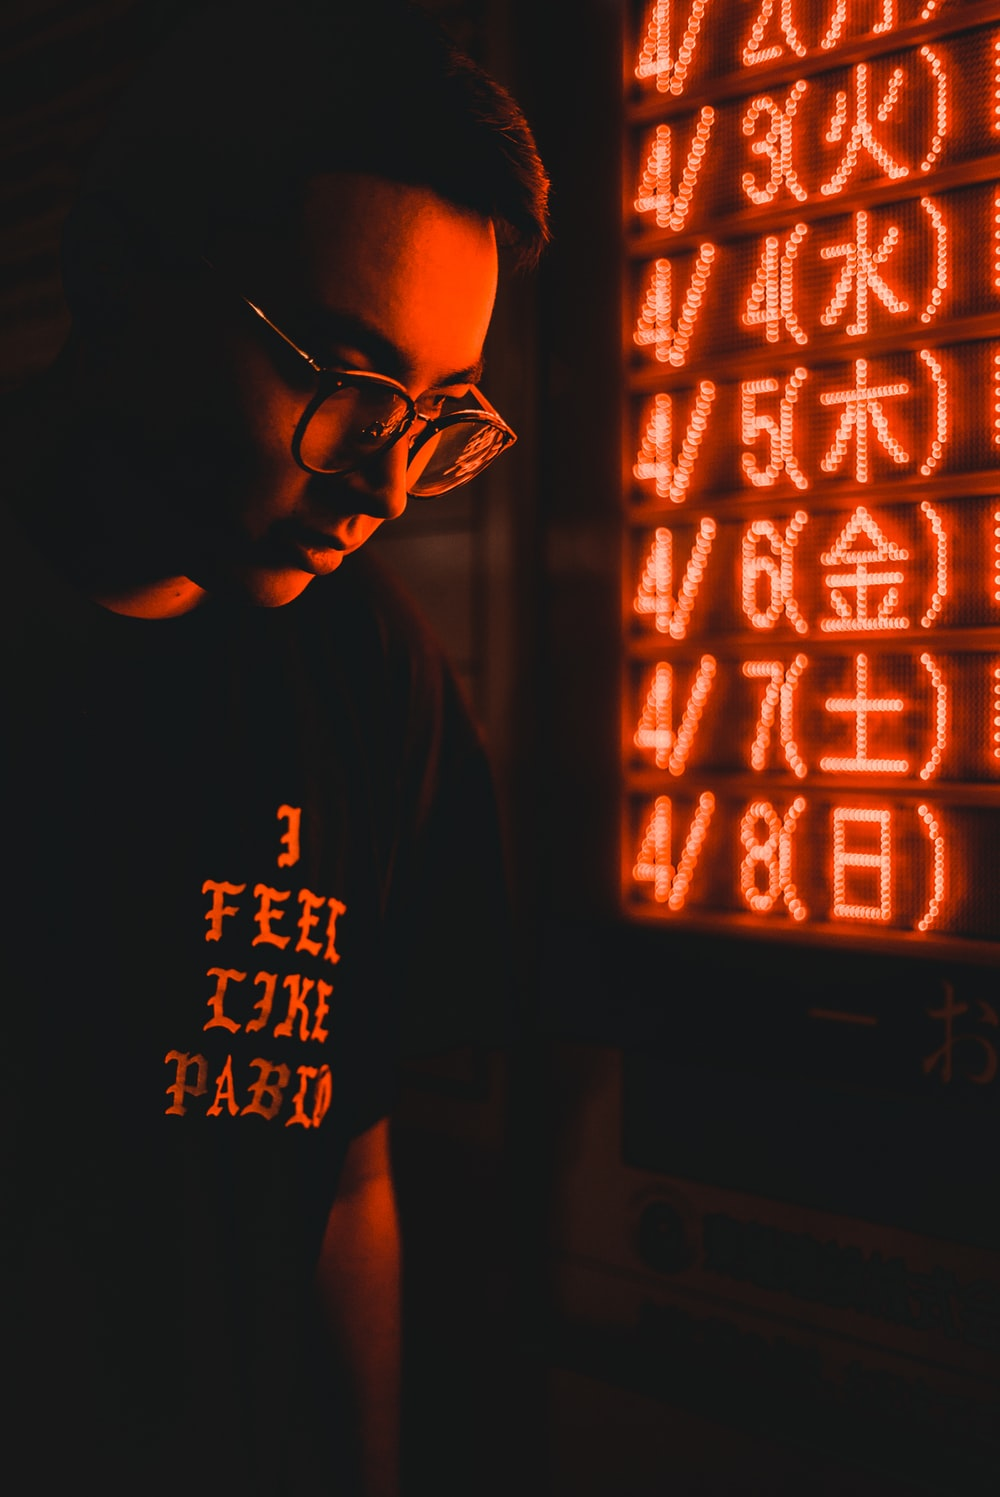 man standing near LED signage